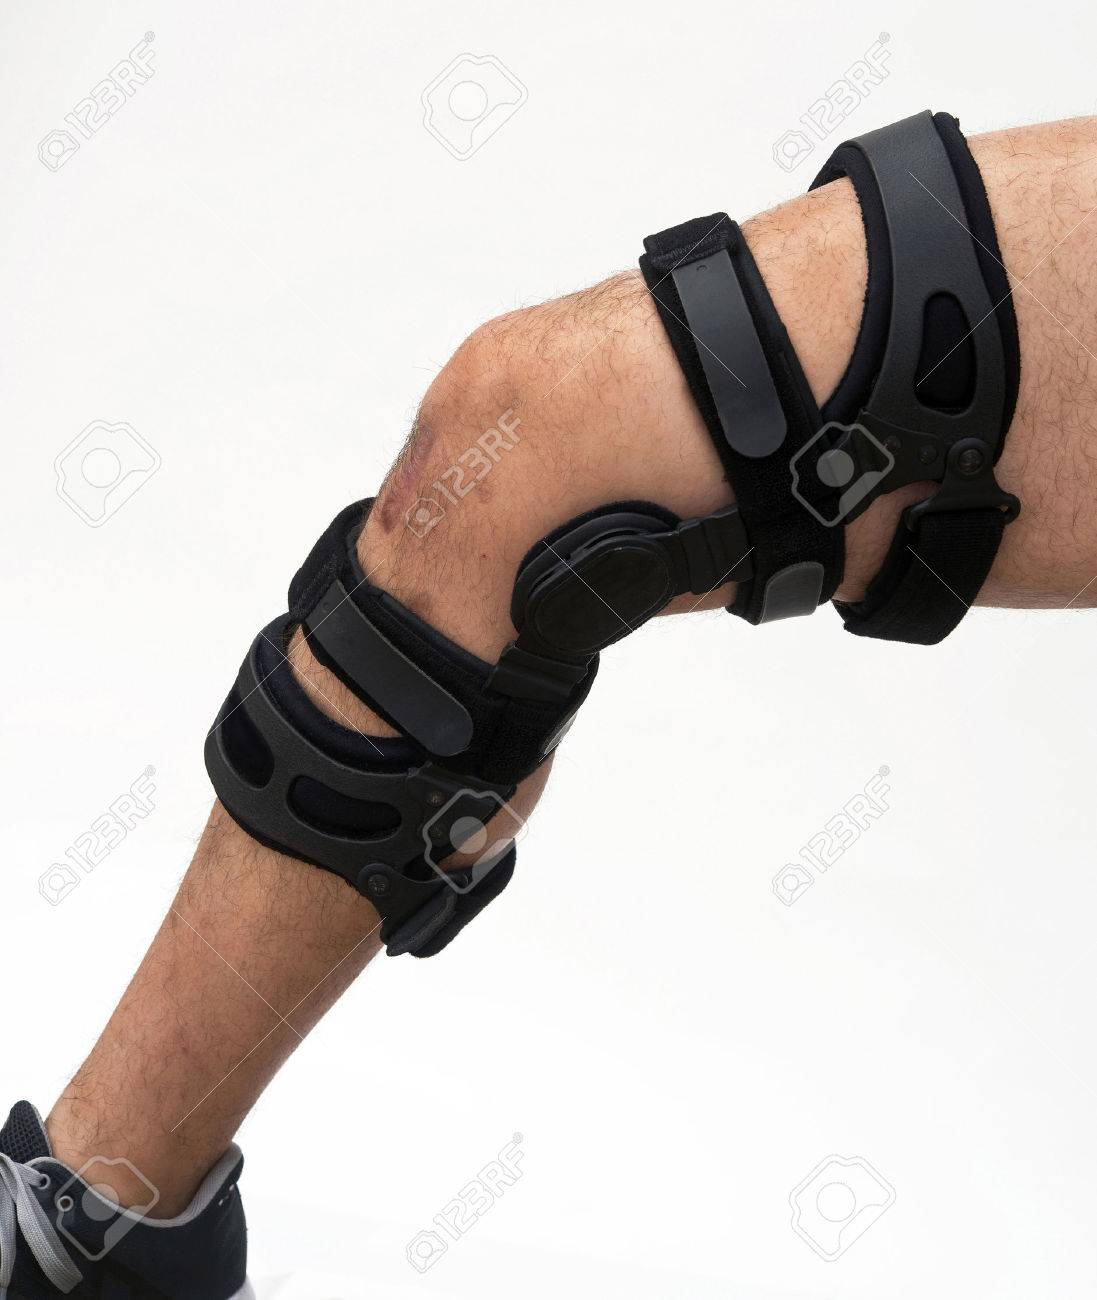 Knee brace for ACL football knee injury Stock Photo - 24540318